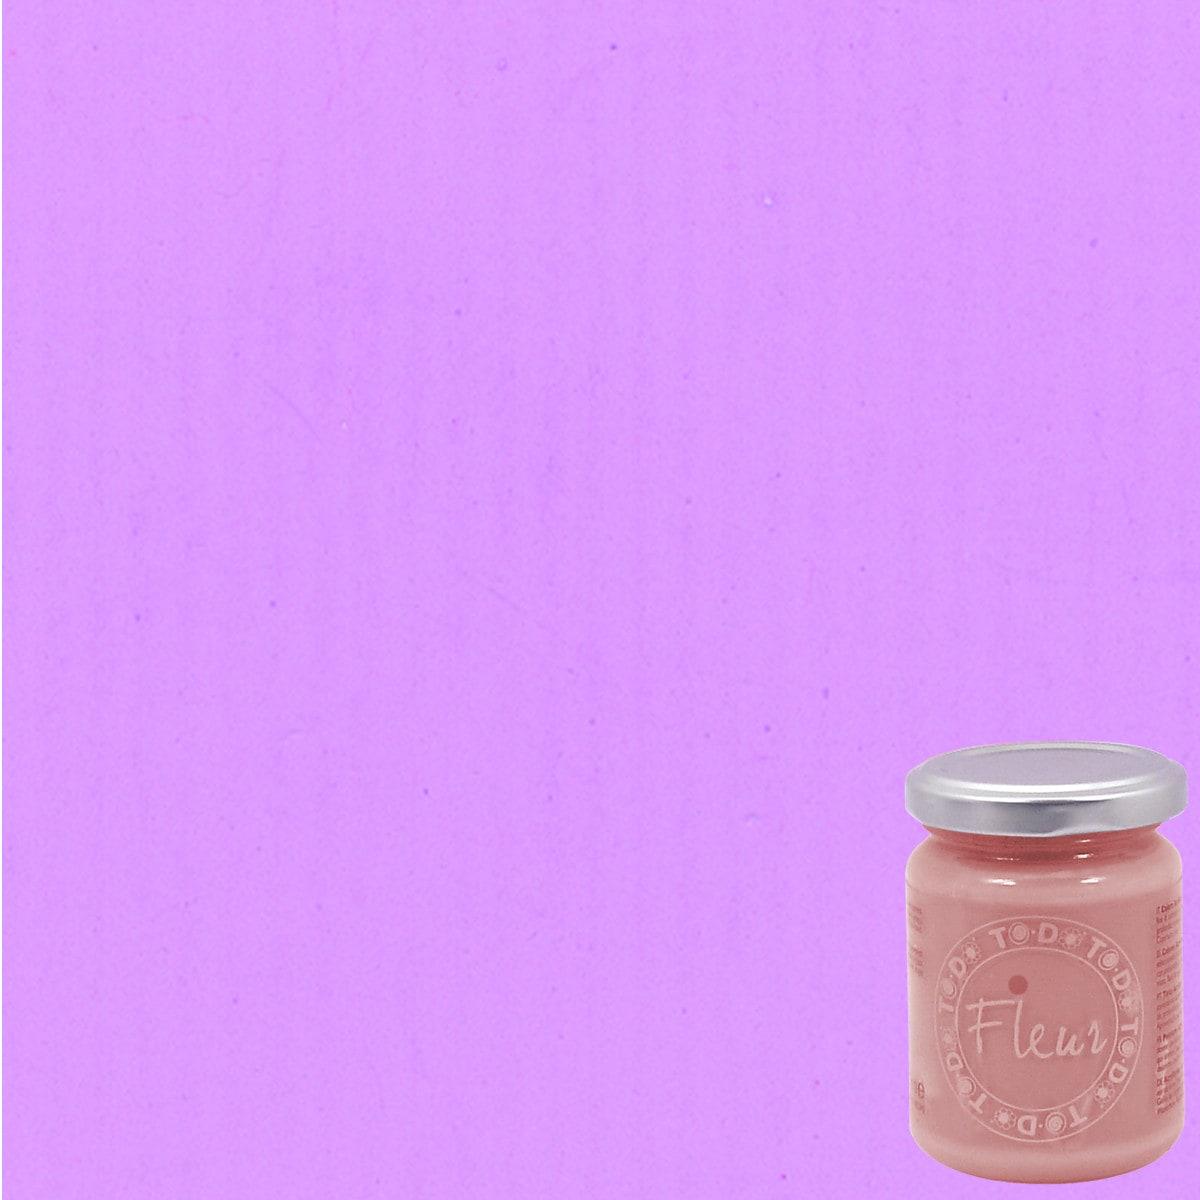 Pittura Shabby Leroy Merlin pittura fleur babydoll silk 0.13 l rosa shabby chic